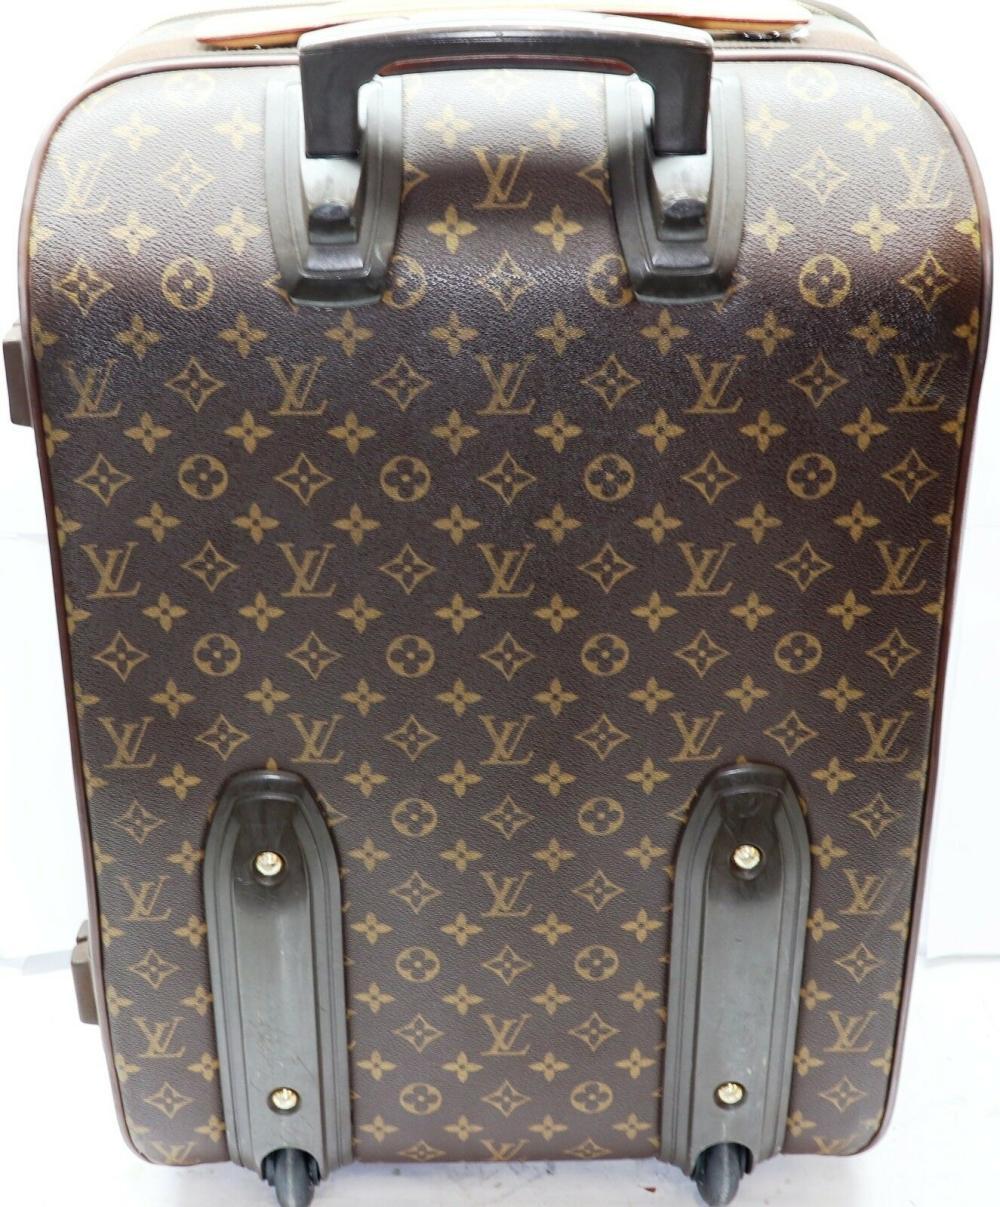 Lot 147: Louis Vuitton Monogram Pegase 55 Travel Carry On Bag